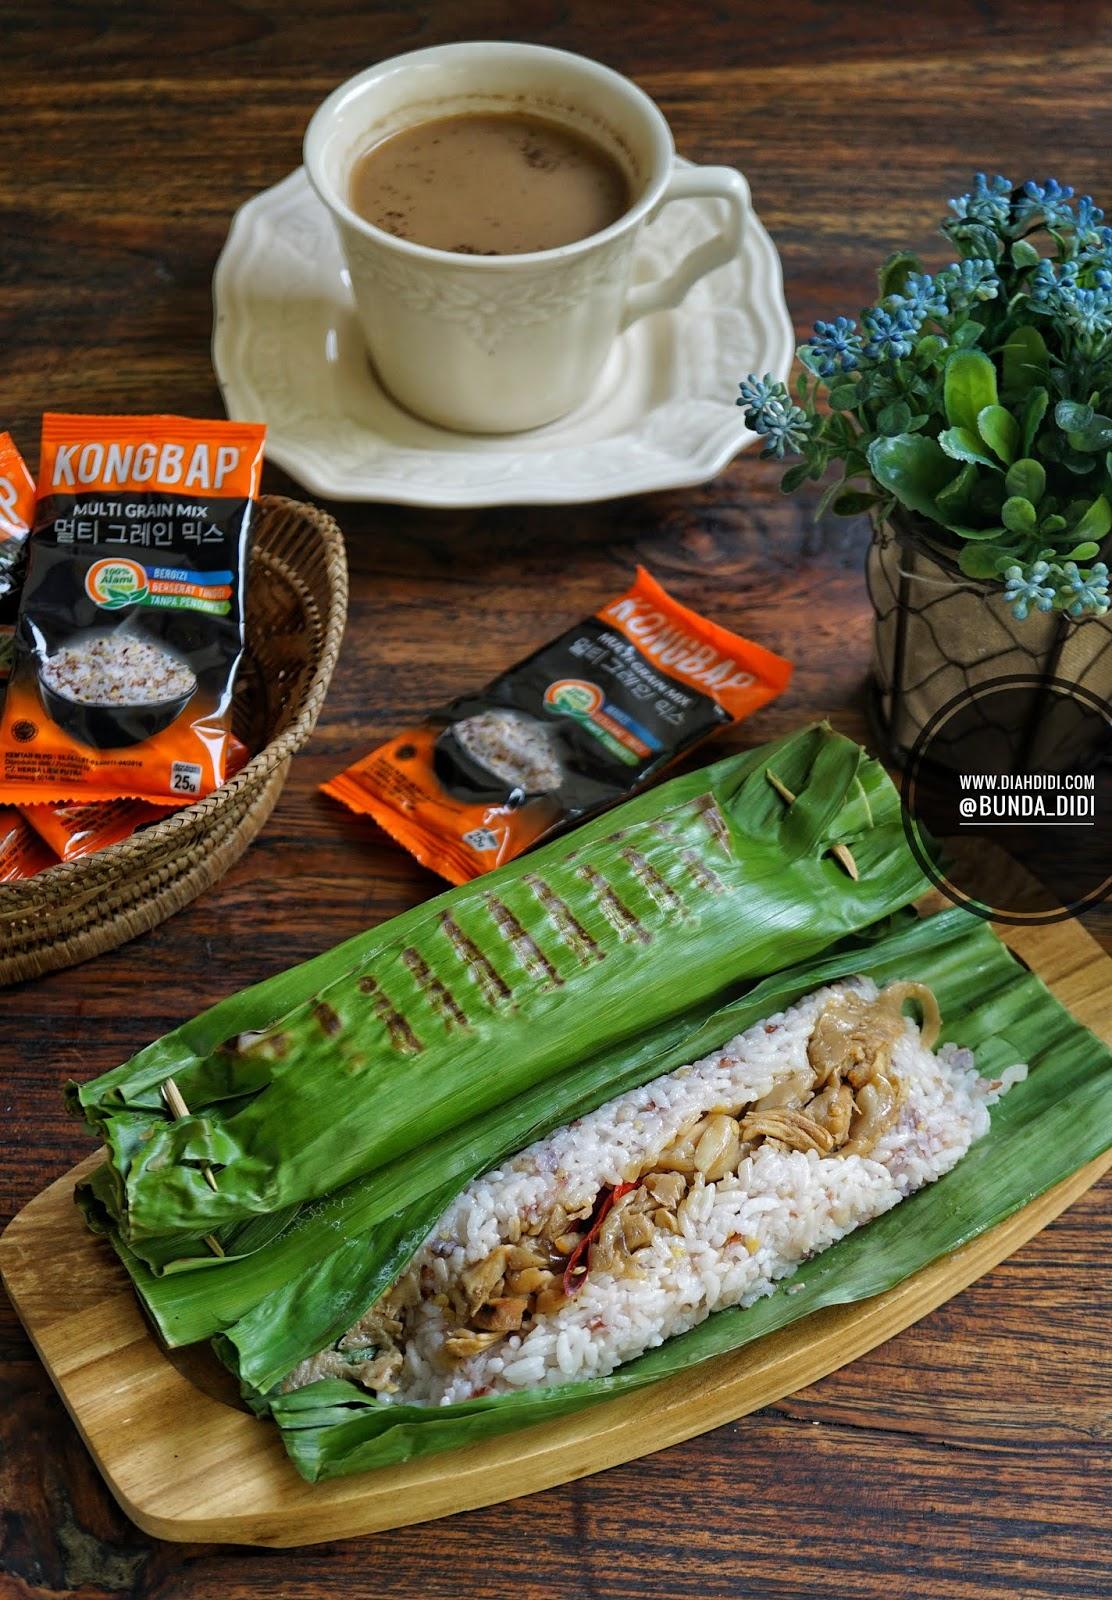 Diah Didis Kitchen Nasi Bakar Ayam Jamur Kongbap Multi Grain Mix Waktunya Healthy Menu With Ya Teman Untuk Minggu Ini Aku Masak Yang Praktis Aja Isi